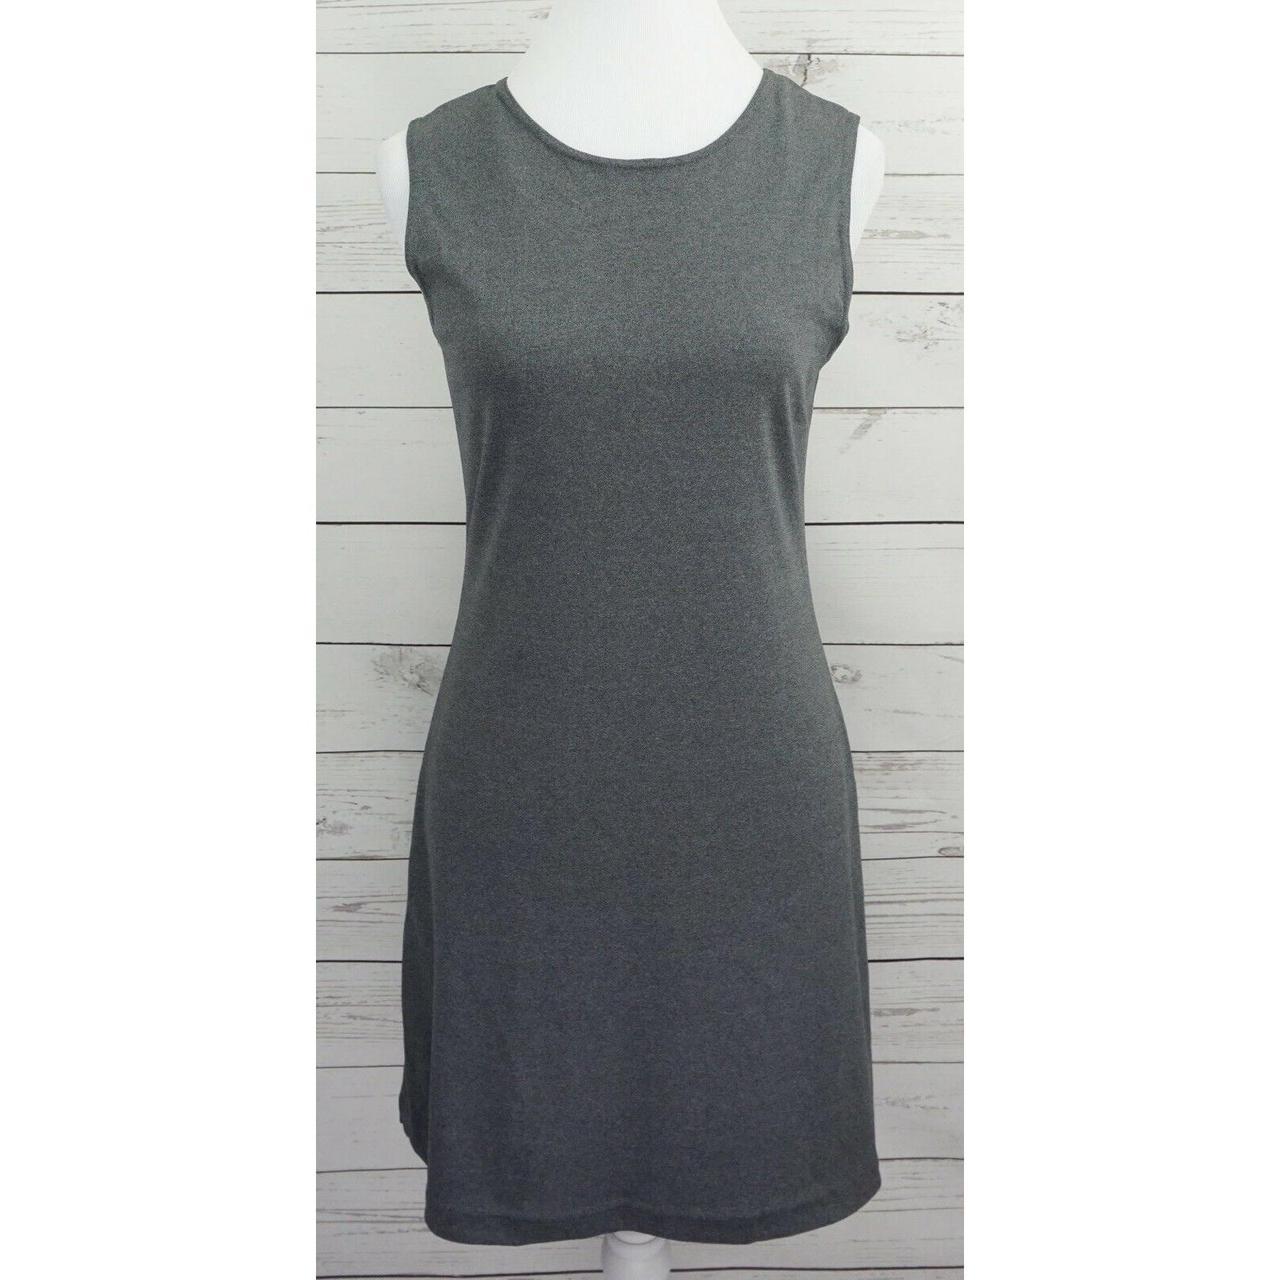 Product Image 1 - La Belle Dress Womens Small